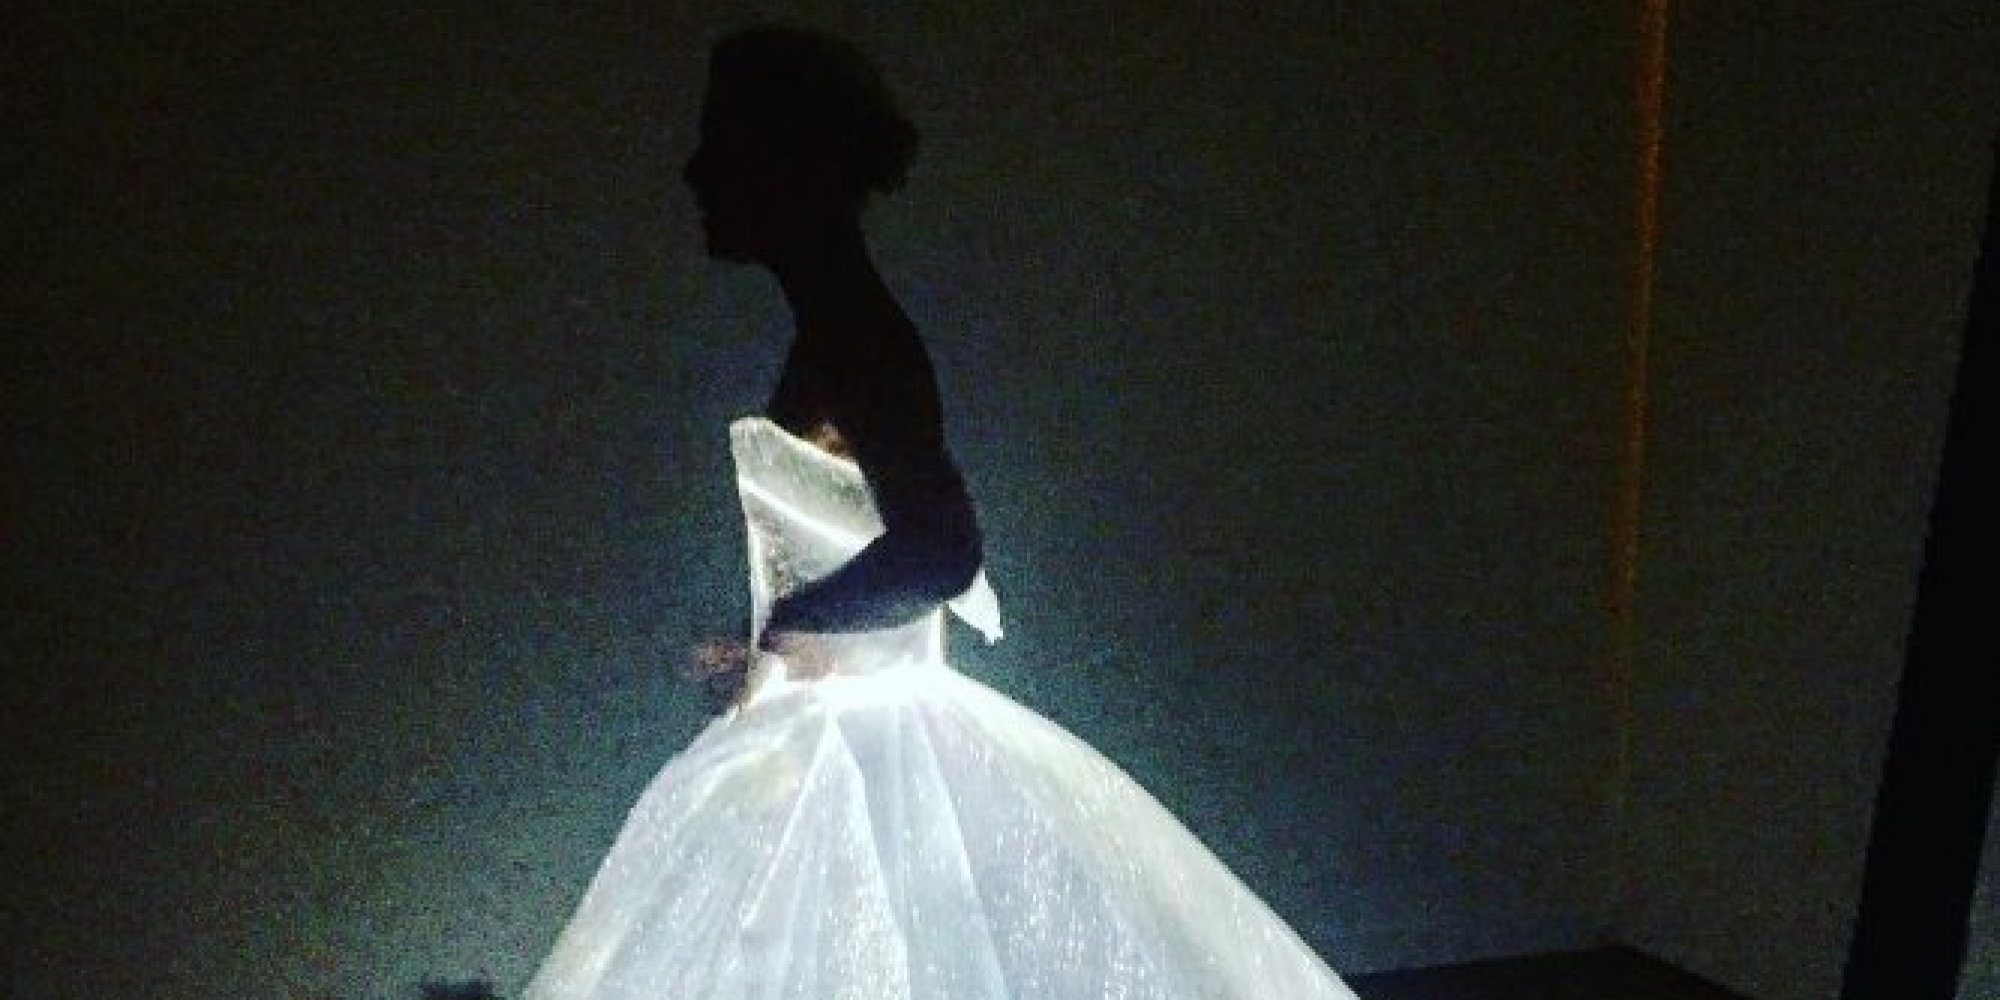 Met Gala 2016 Claire Danes Channels Cinderella In Zac